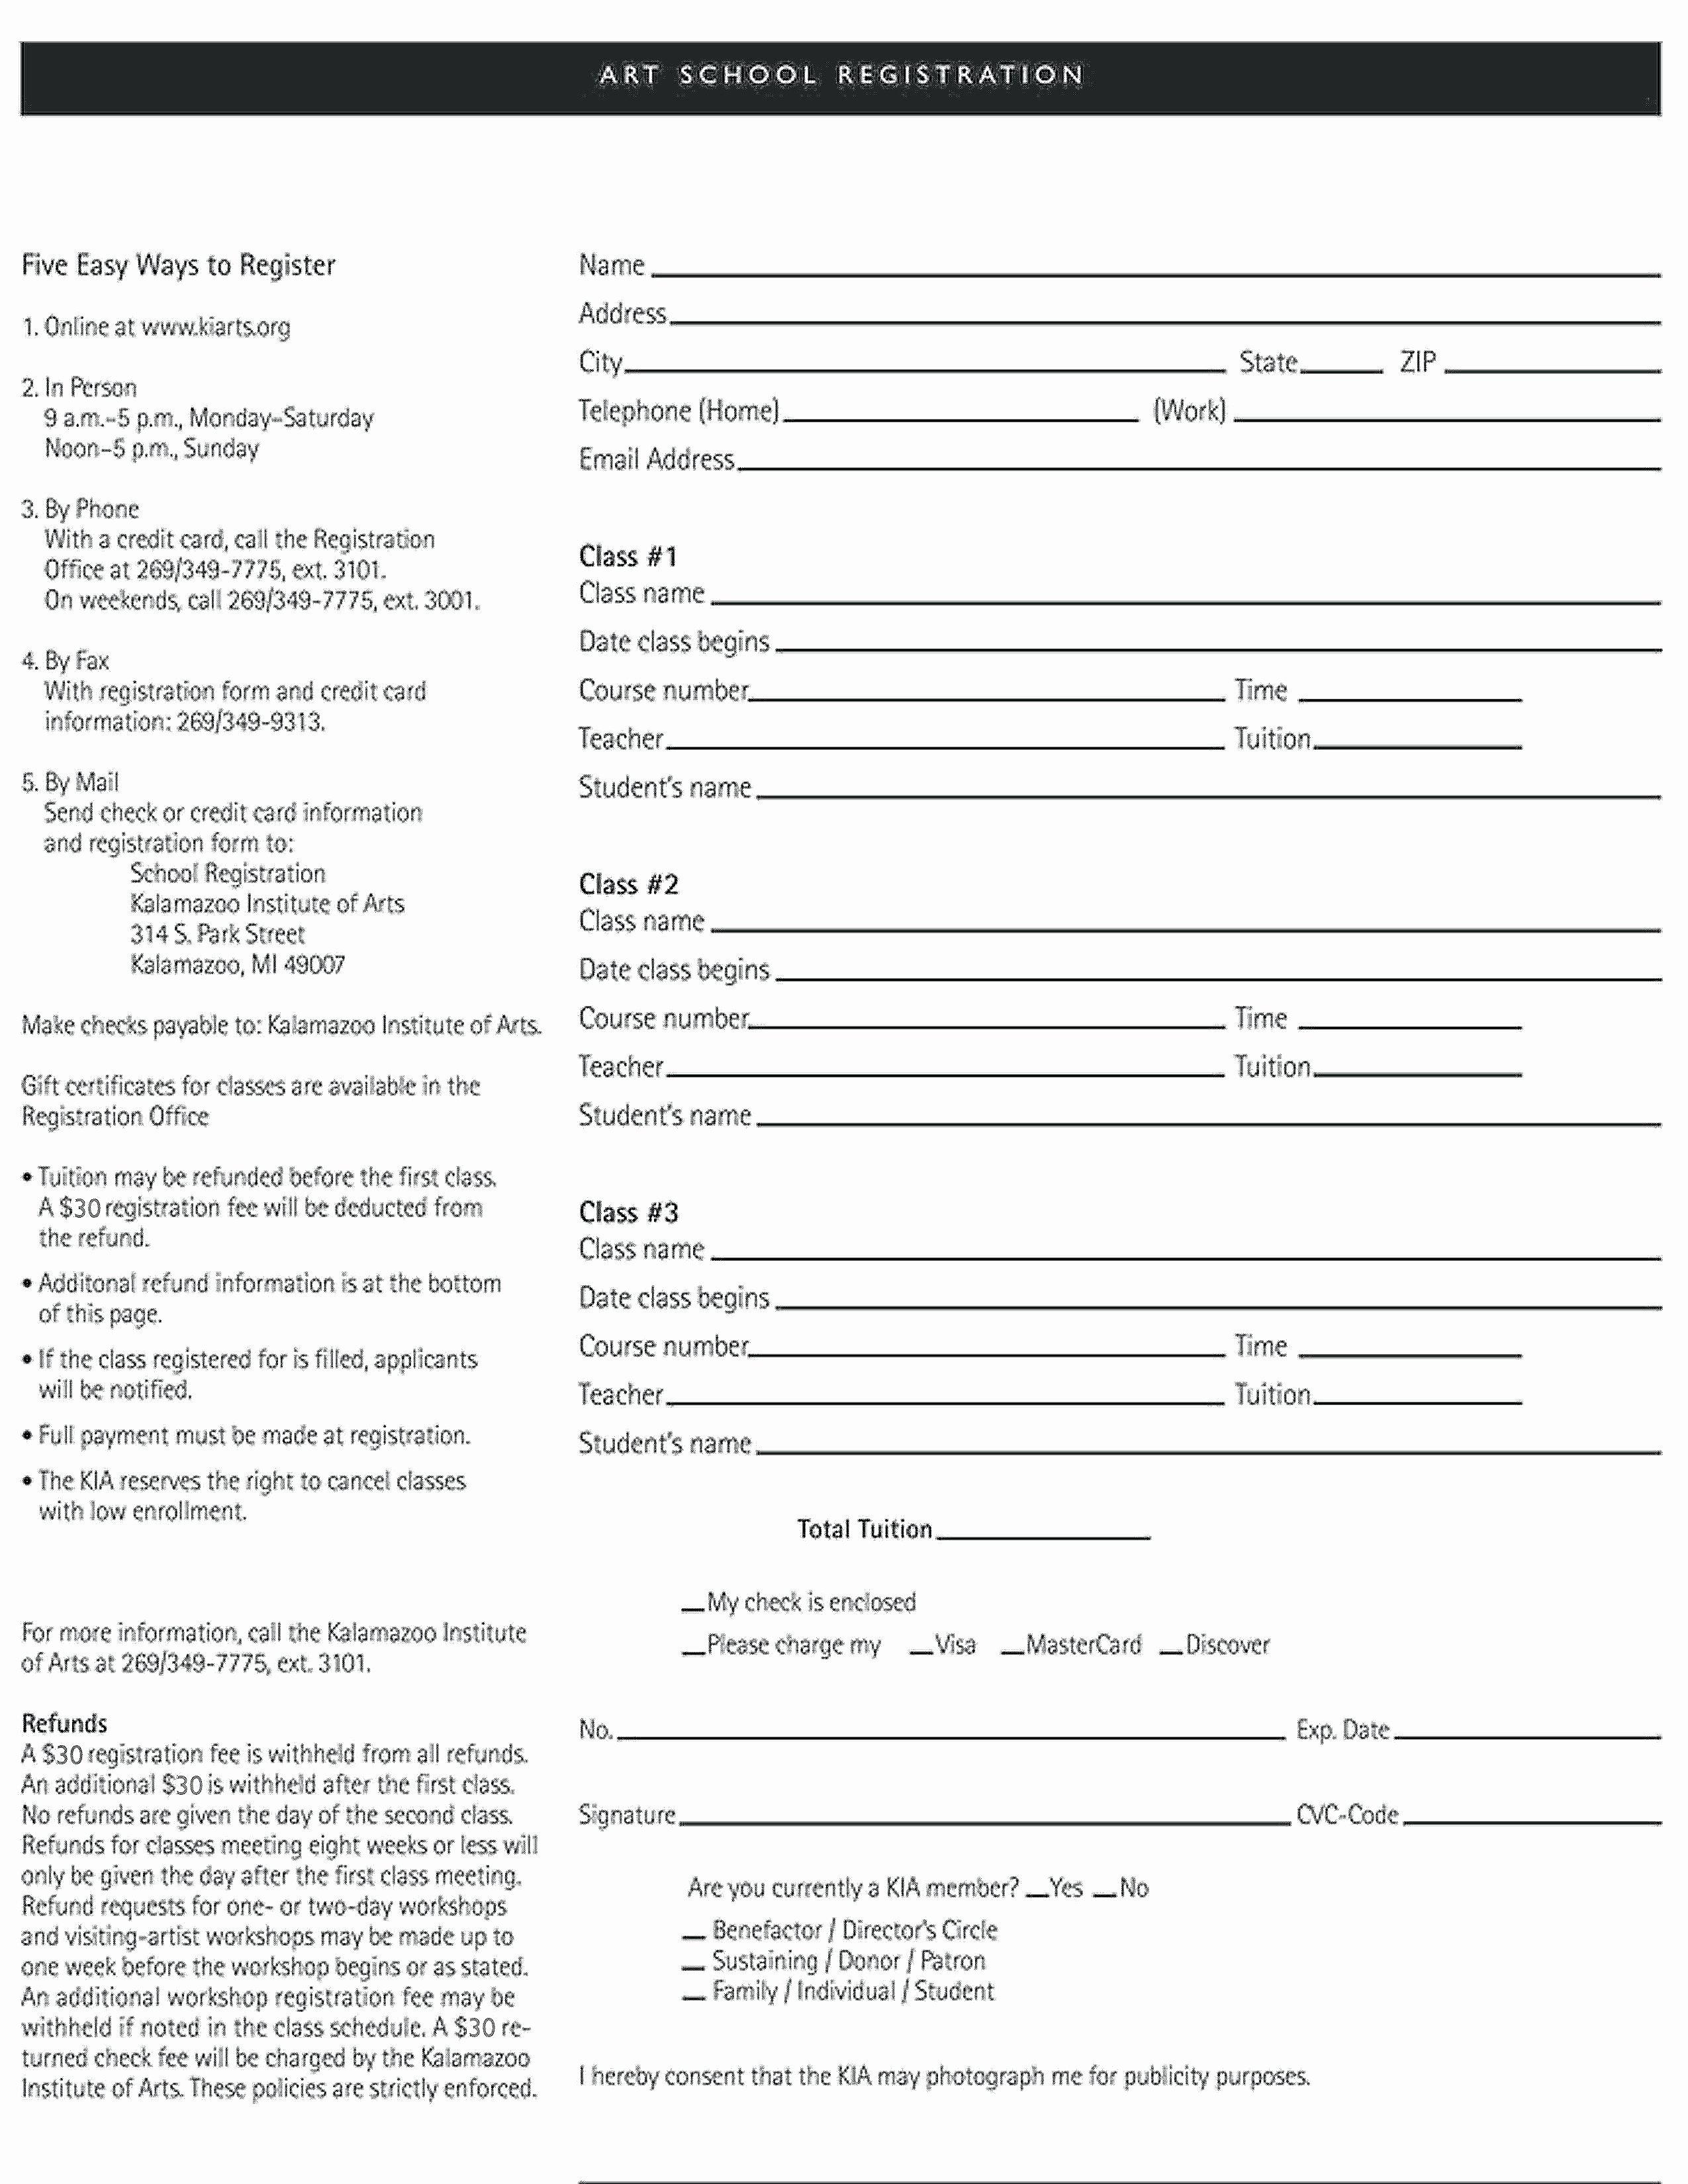 School Registration form Template New Template Enrollment form Template